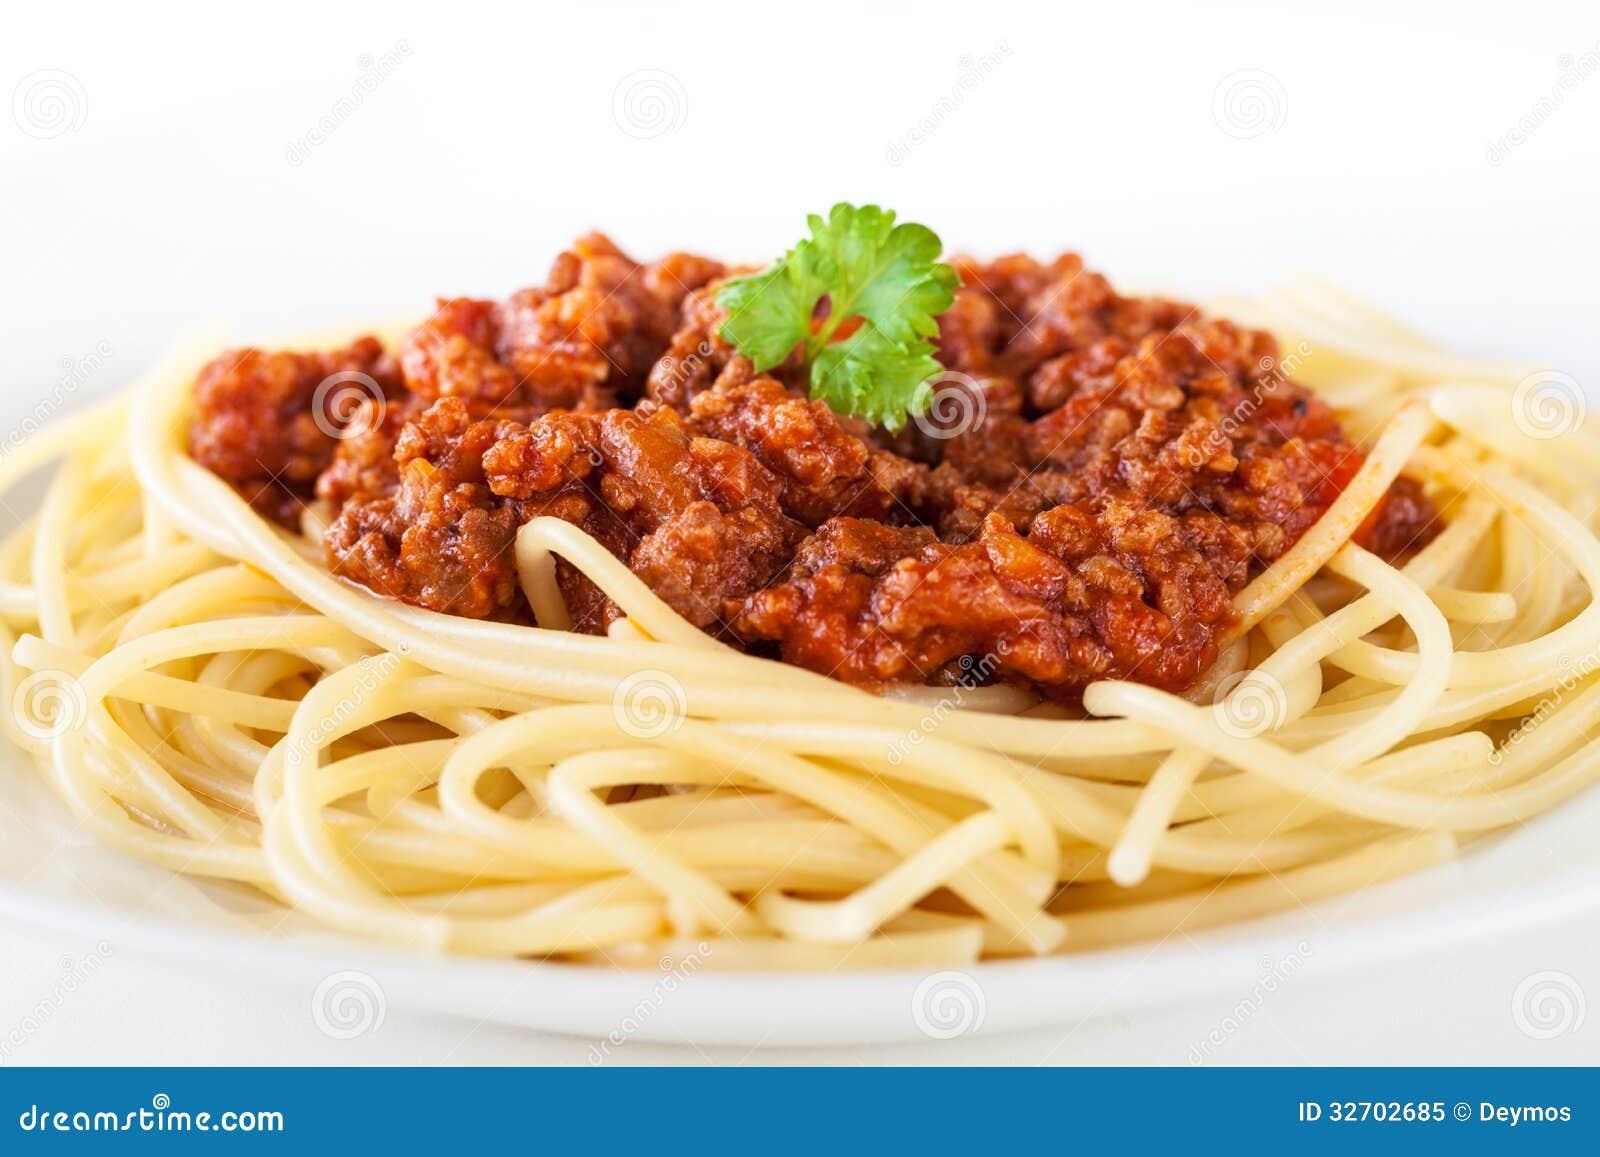 Spaghetti Bolognese Royalty Free Stock Photo Image 32702685